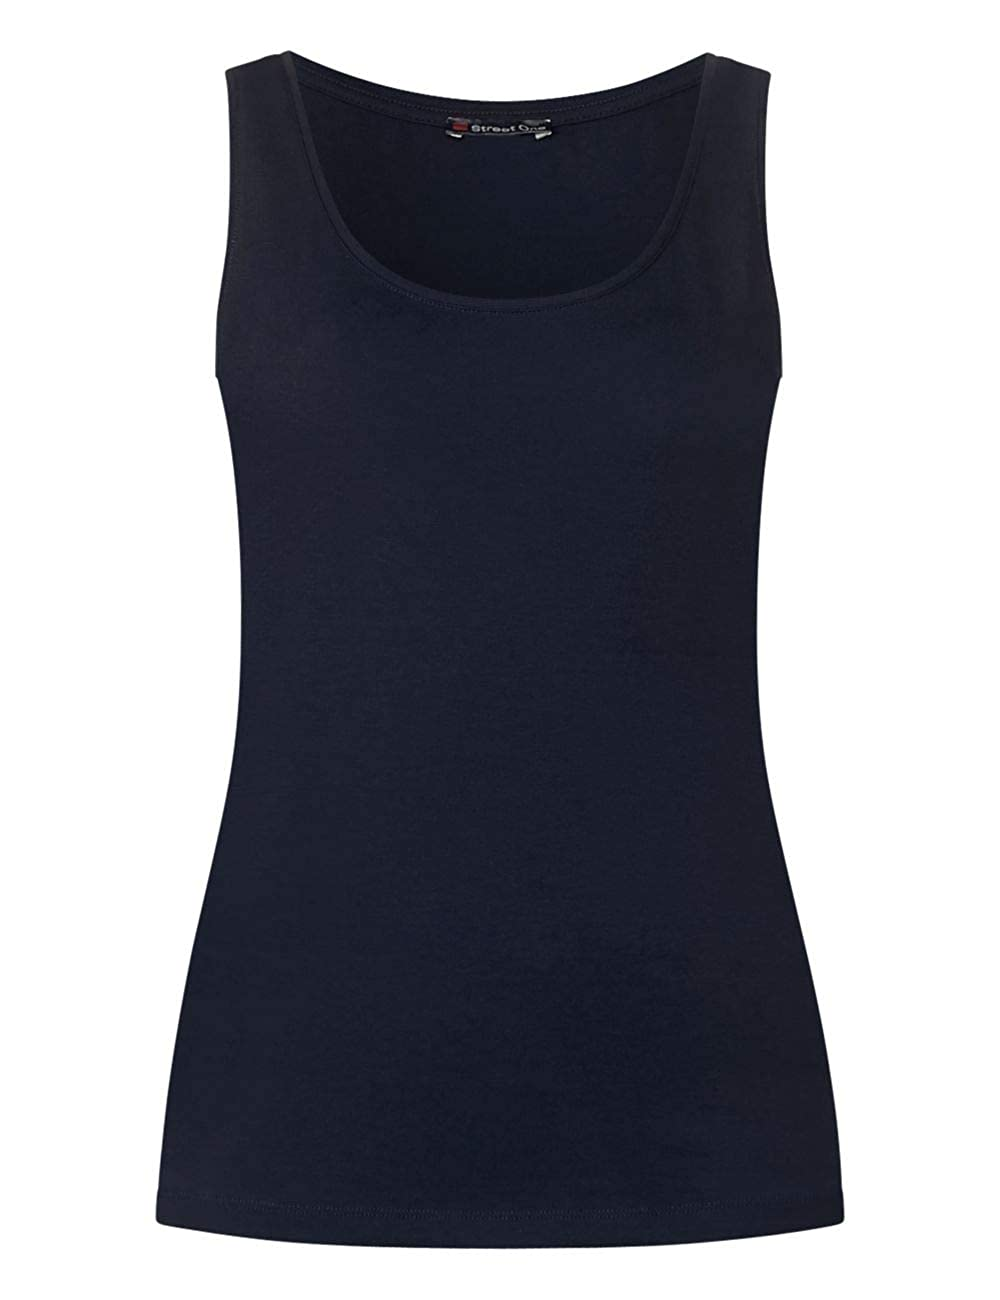 Street One Womens Vest